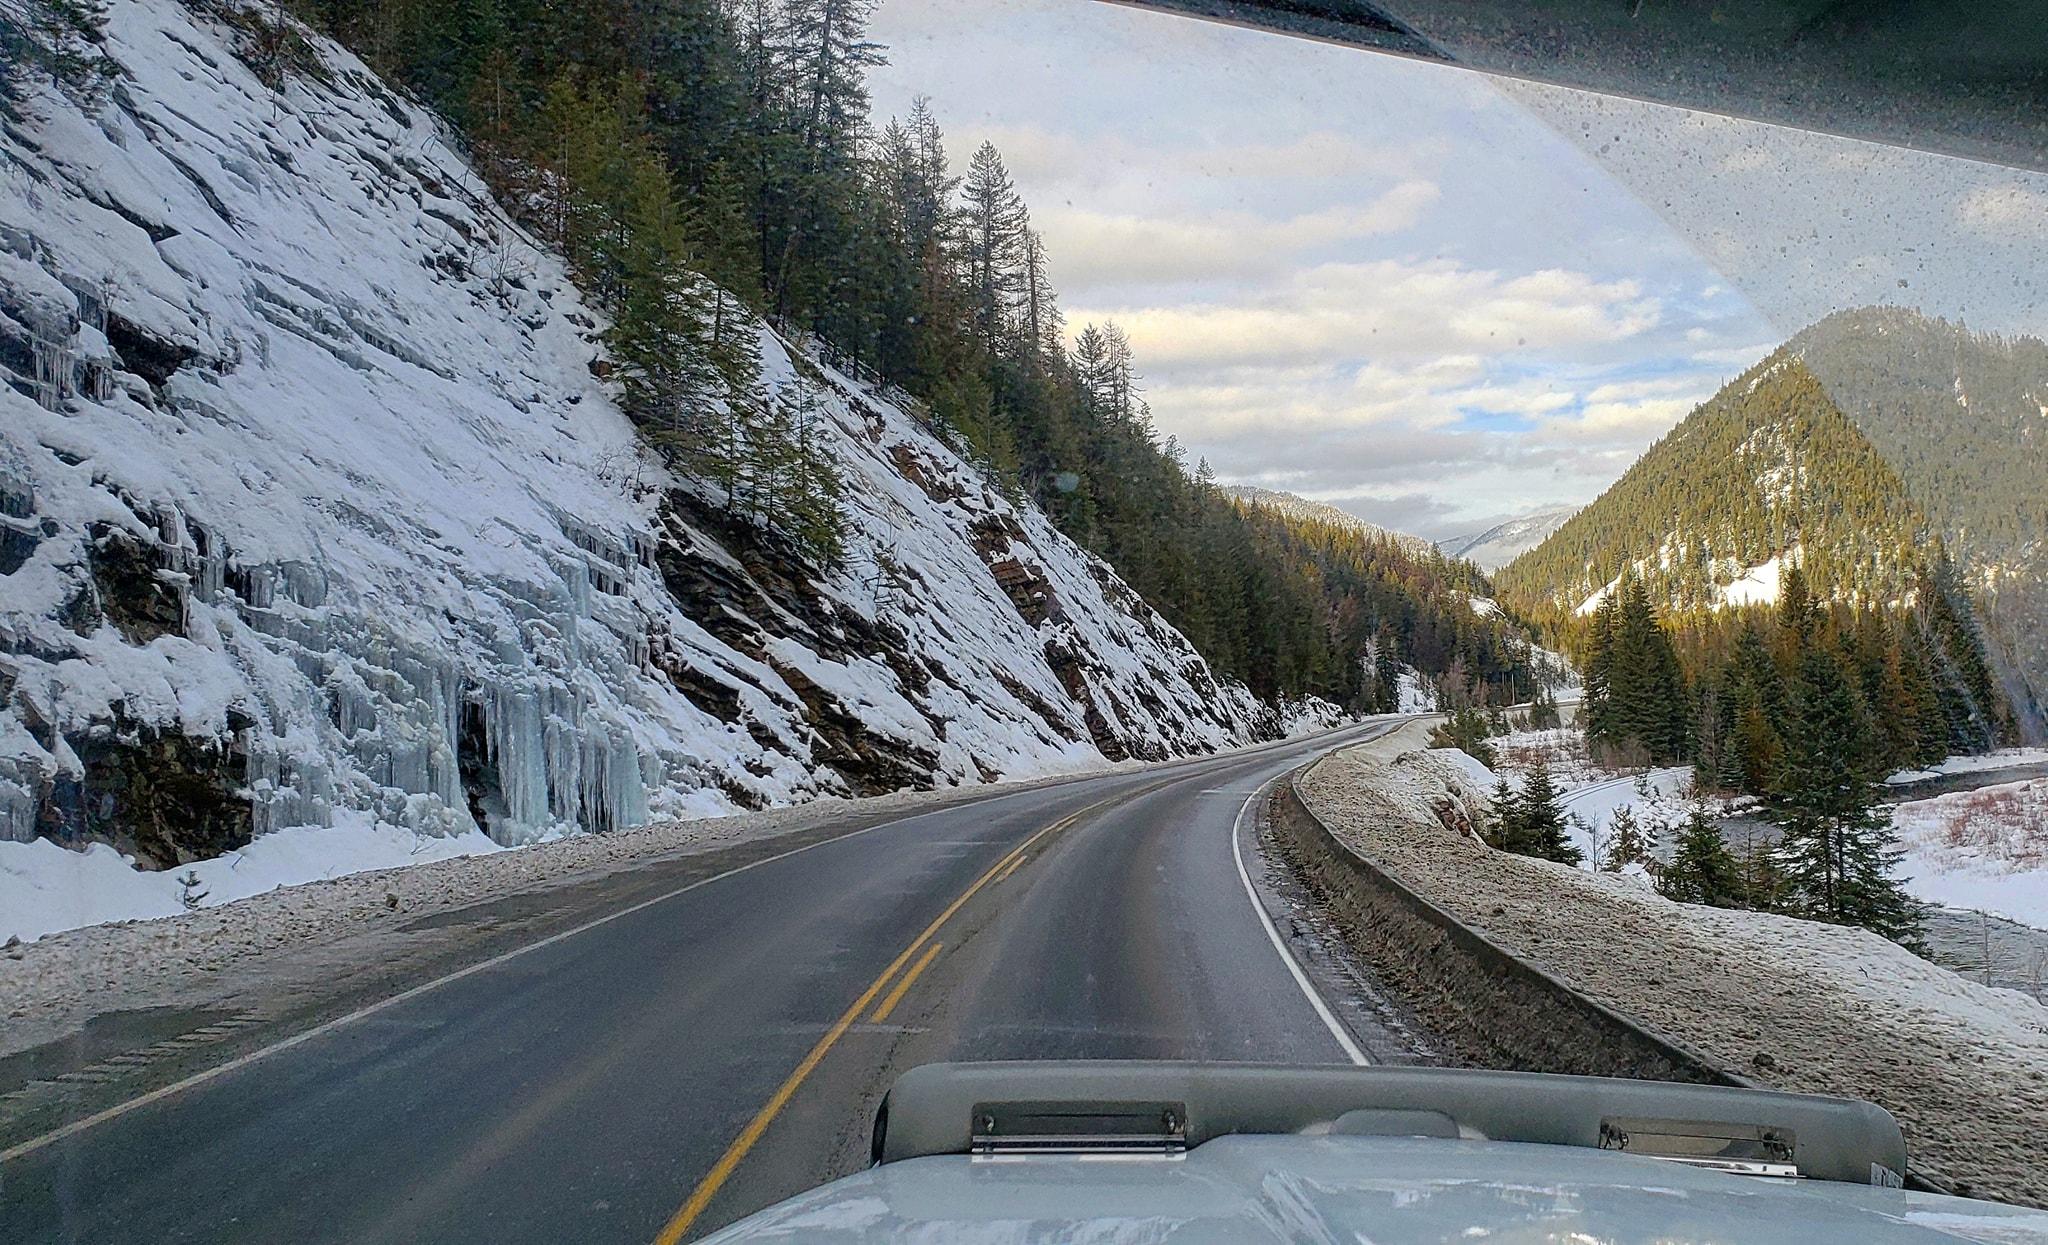 6-1-2019-rondreis-van-2800-km-Montana-Idaho-Oregon-Washington-(17)